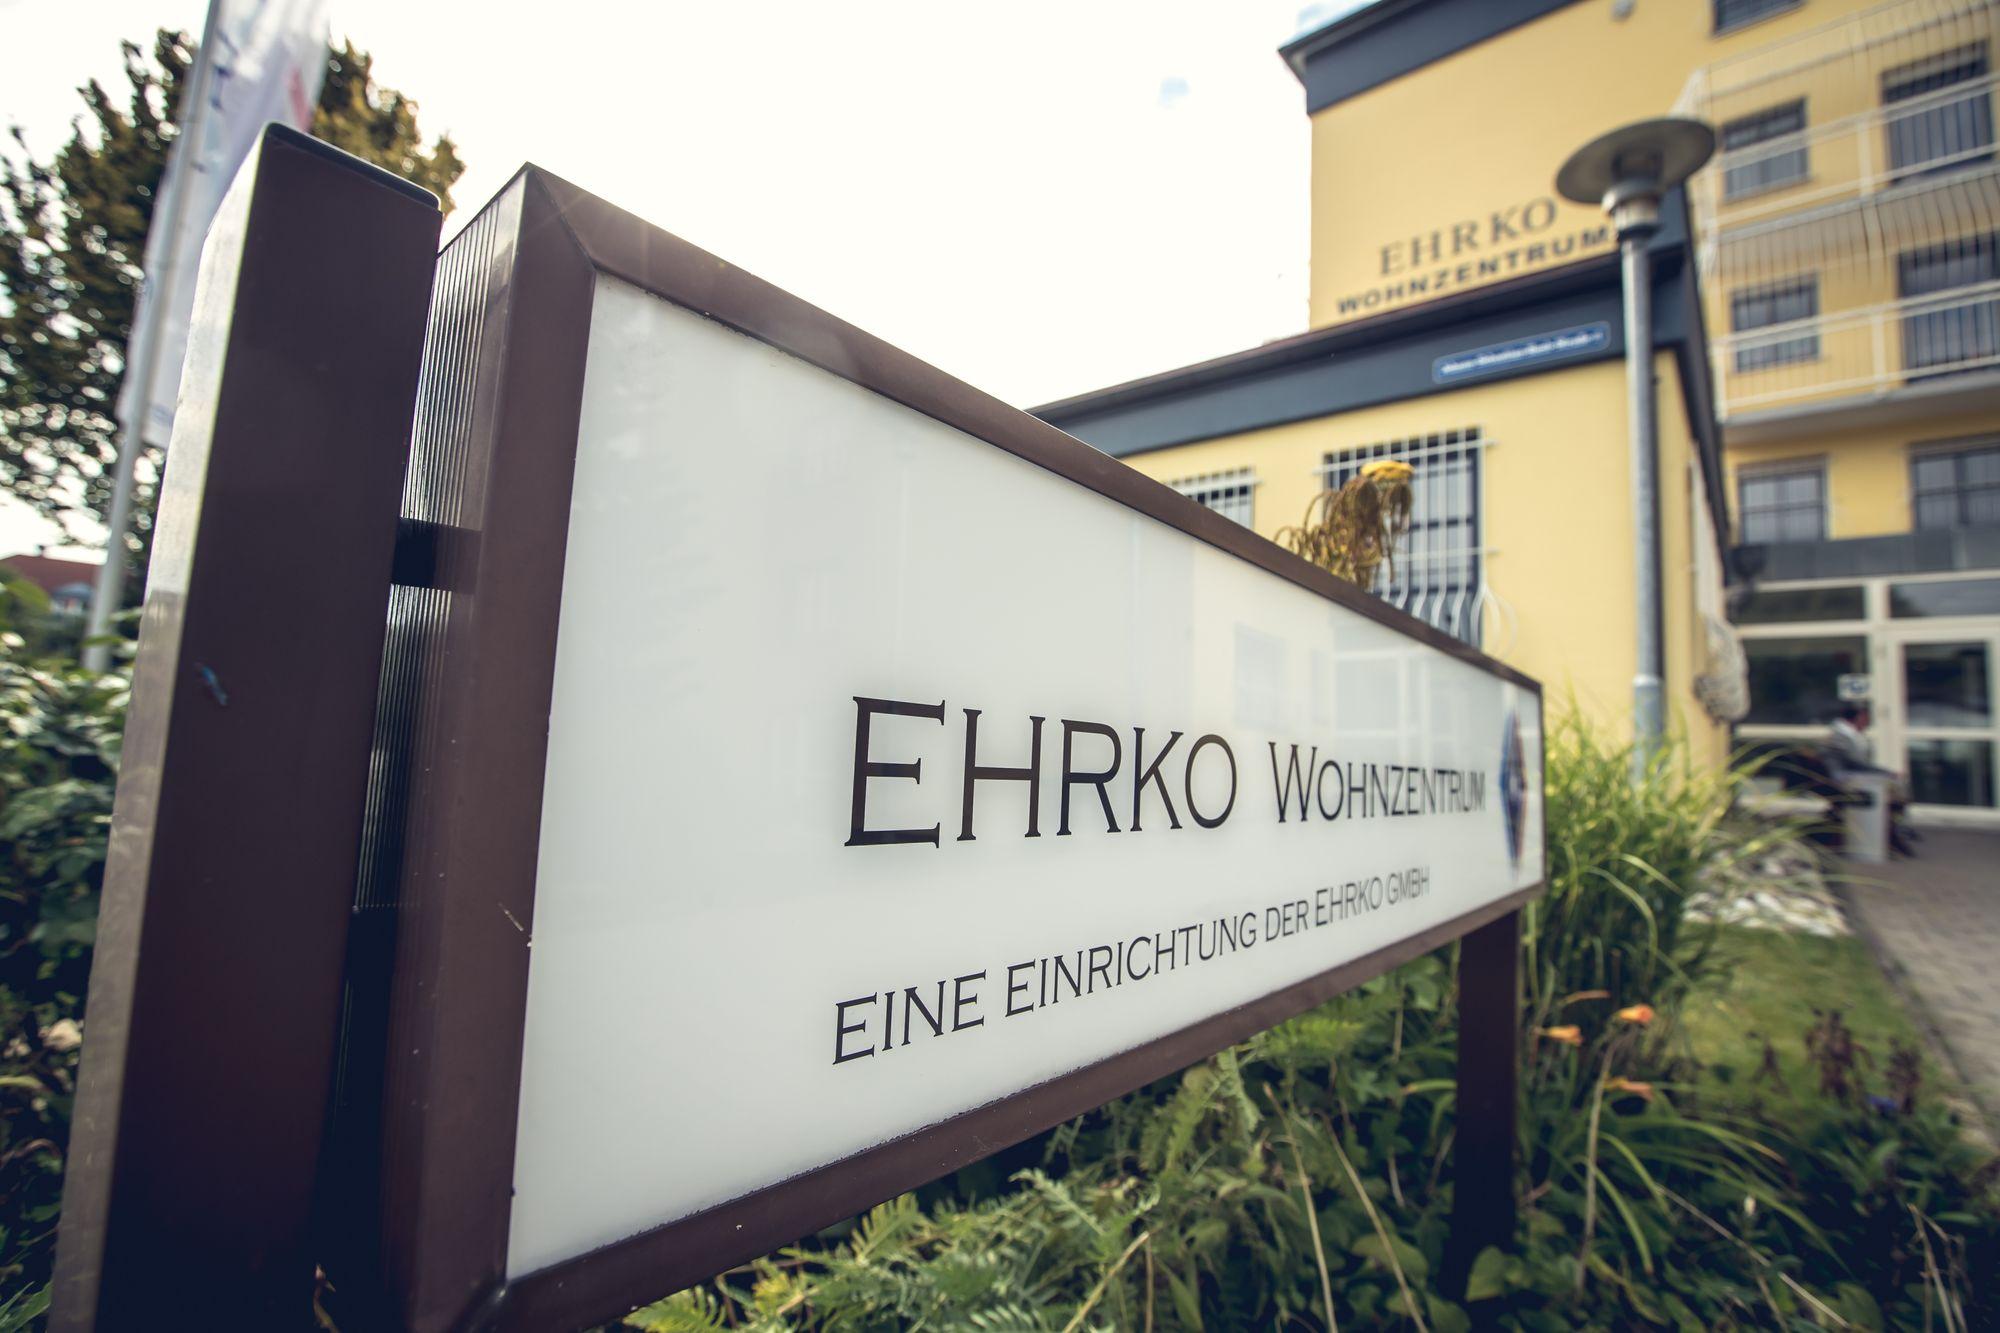 ehrko-wohnzentrum_az1i6100.jpg